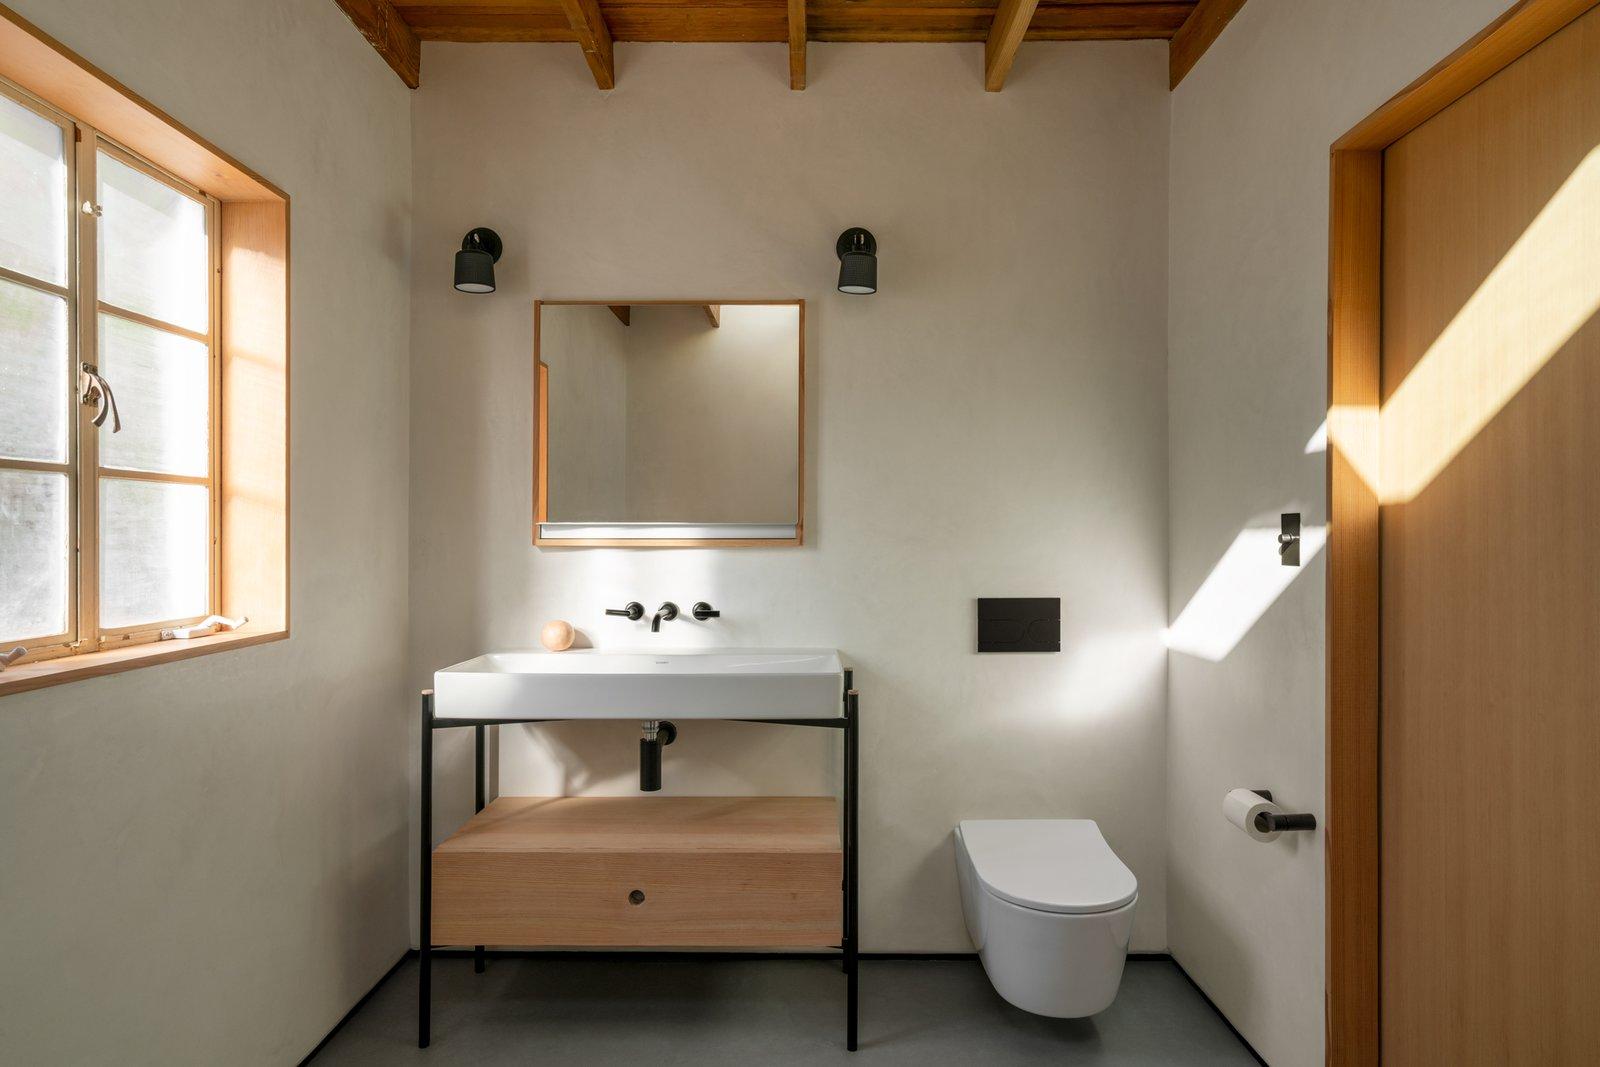 Tucson Territorial by hazelbaker rush primary bath